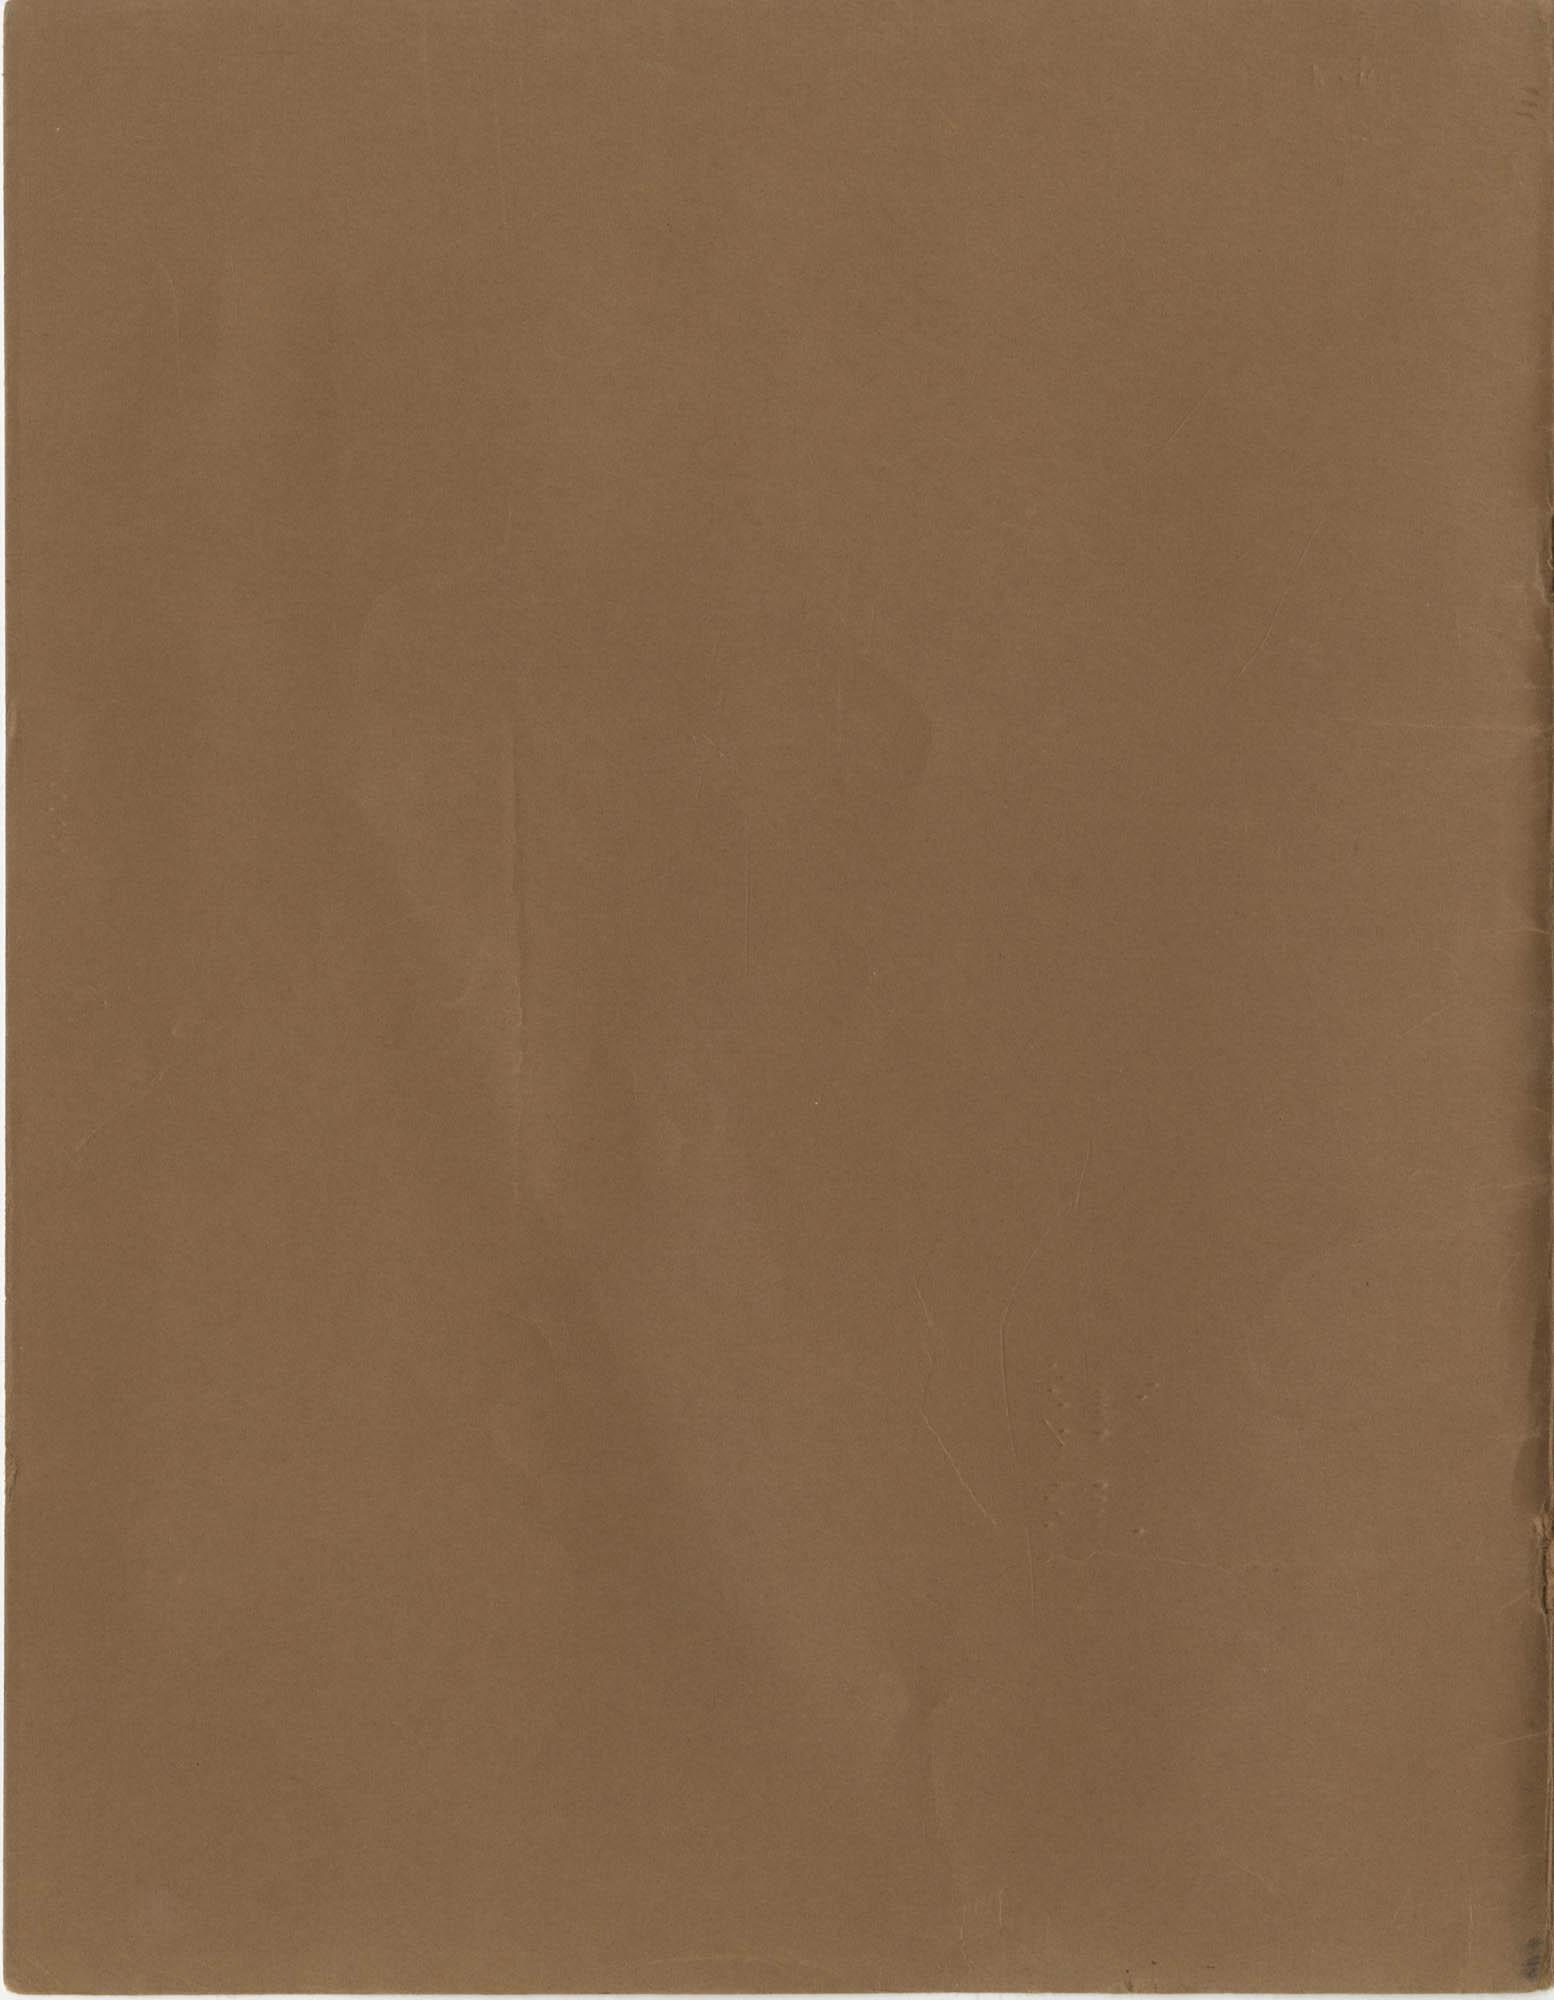 Vista Volunteer Handbook, April 1970, Back Cover Exterior